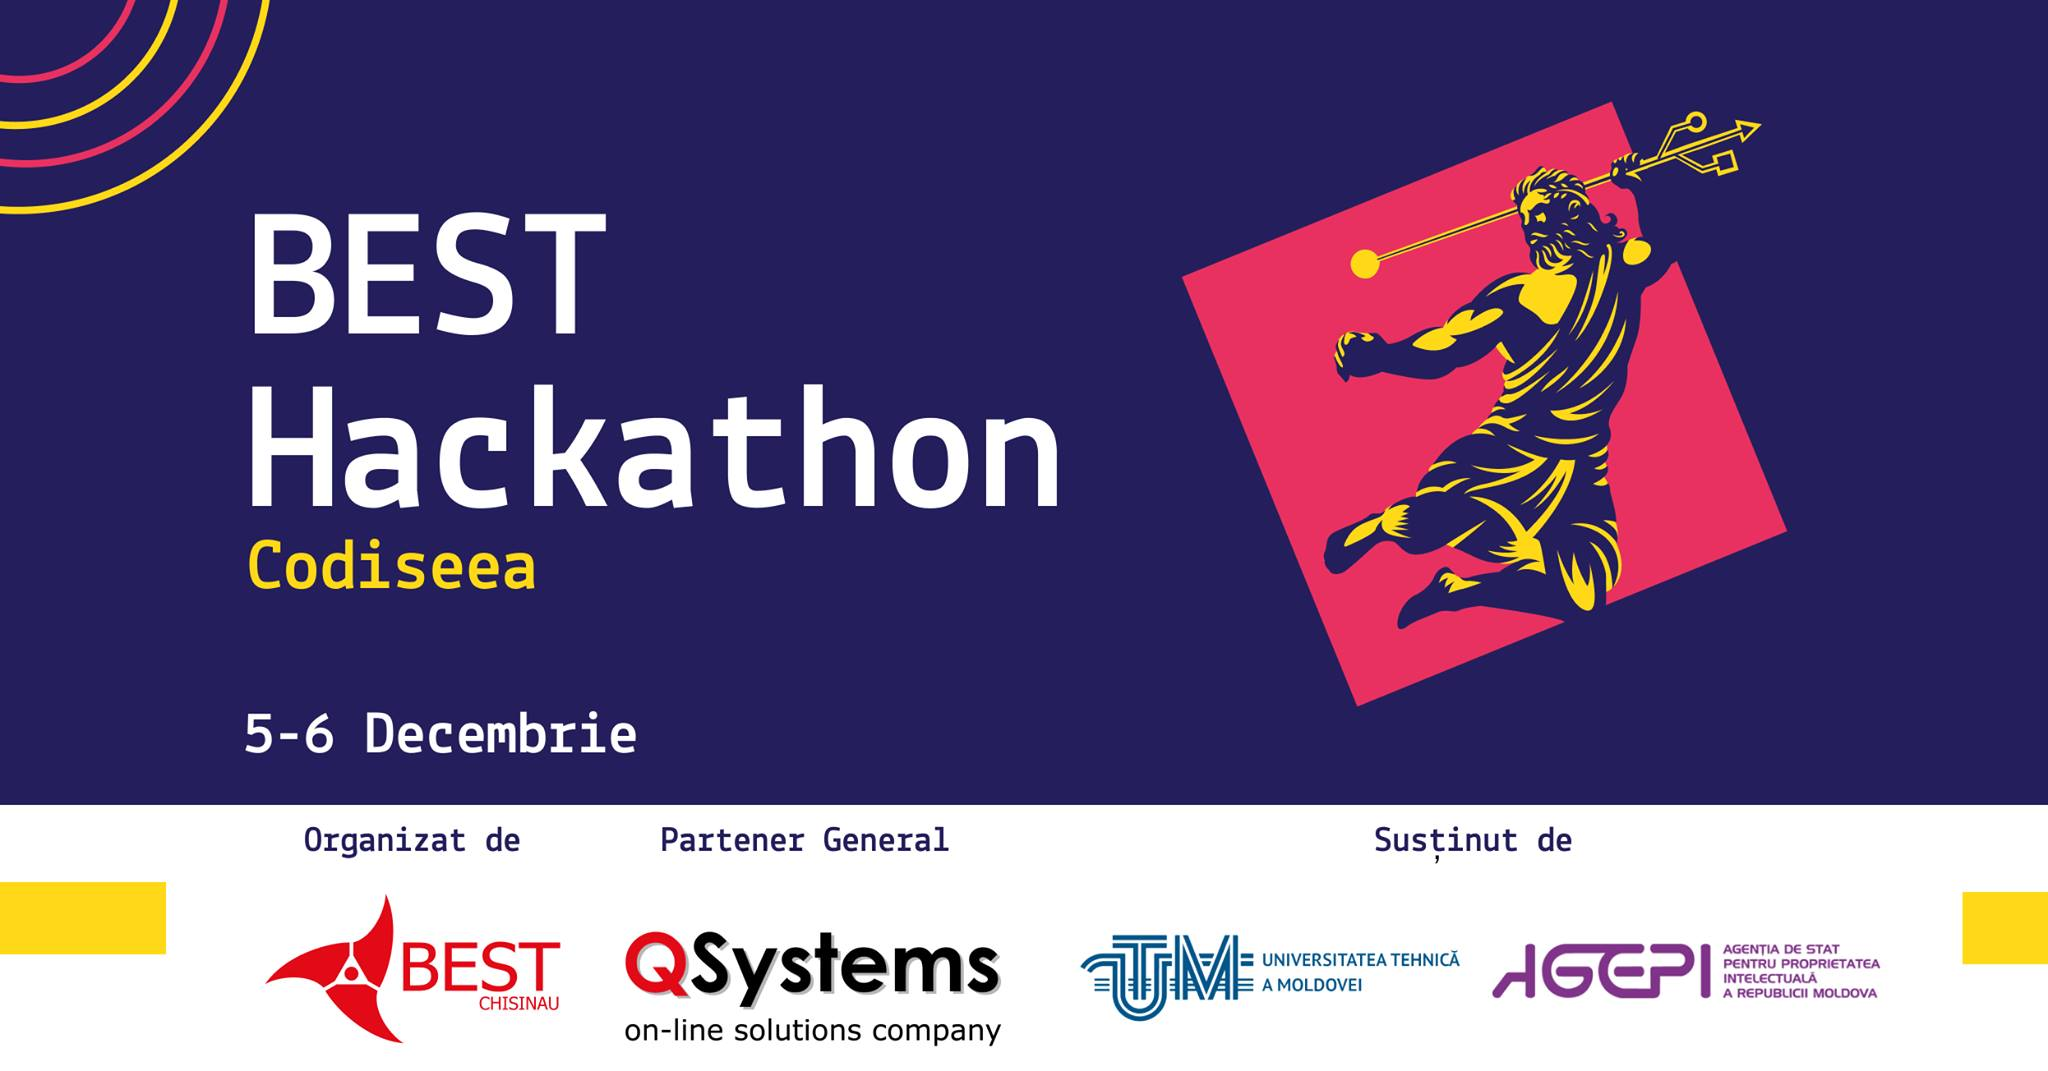 BEST Hackathon